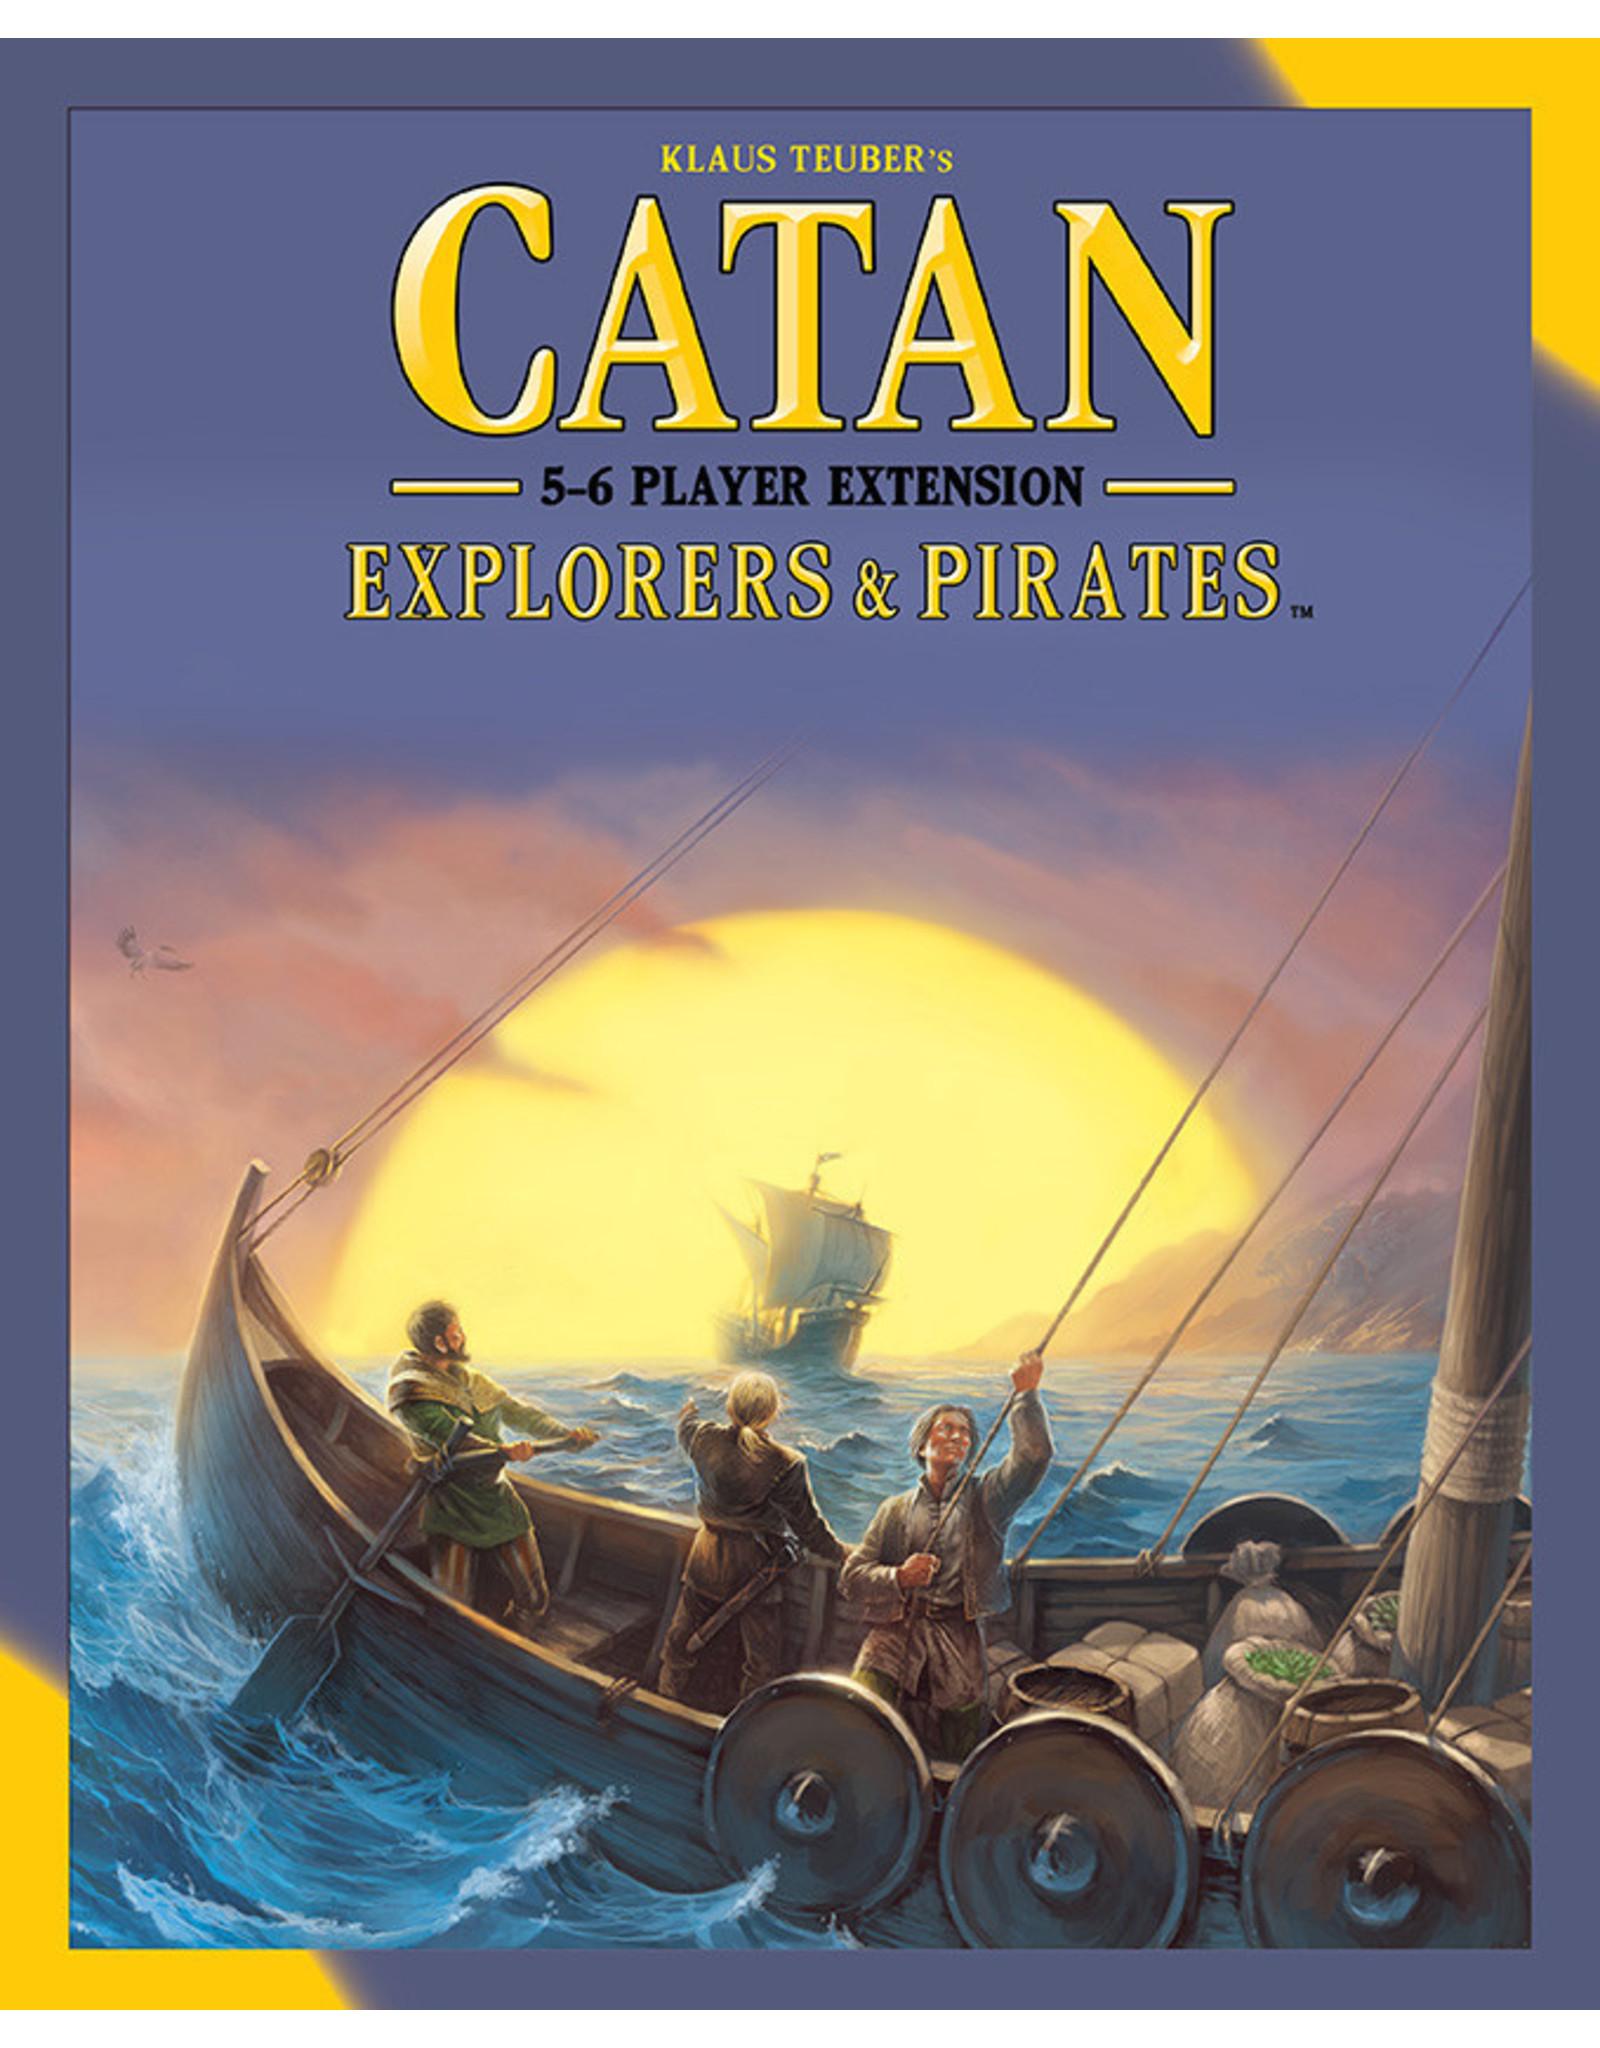 Catan: Explorers & Pirates 5-6 Player Extension